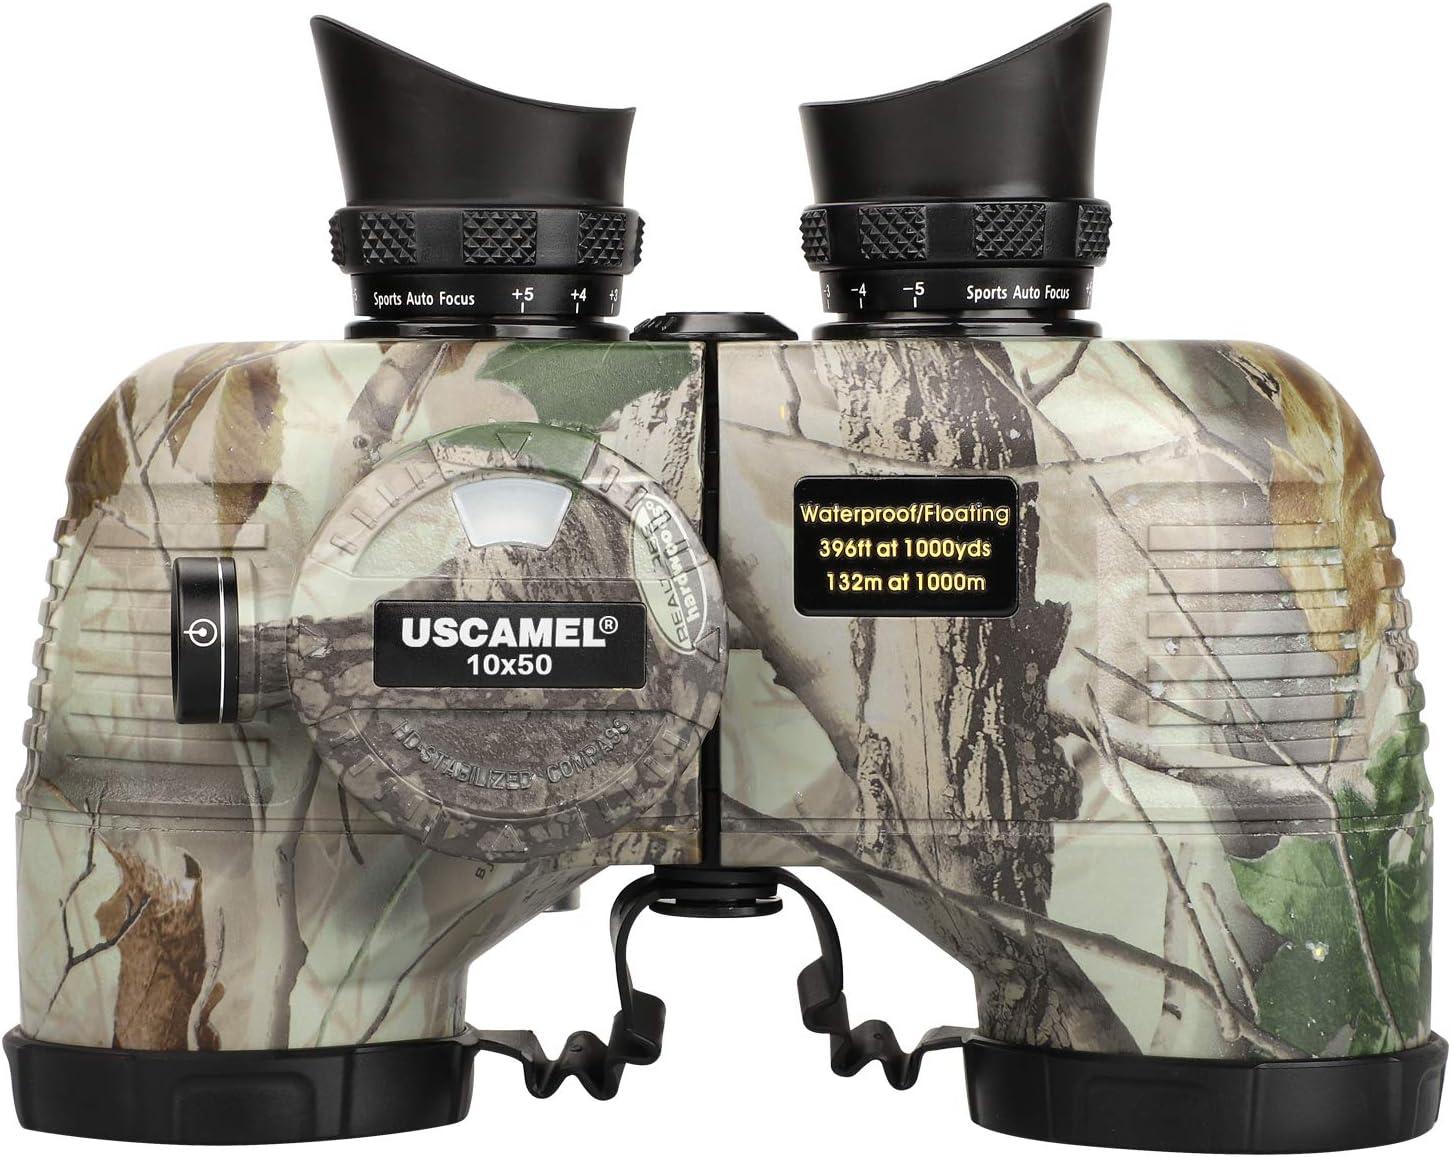 USCAMEL 10x50 Marine Binoculars for Adults, Waterproof Binoculars with Rangefinder Compass,BAK4 Prism FMC Lens Binoculars with Tripod Adapter for Navigation Bird Watching Hunting : Camera & Photo